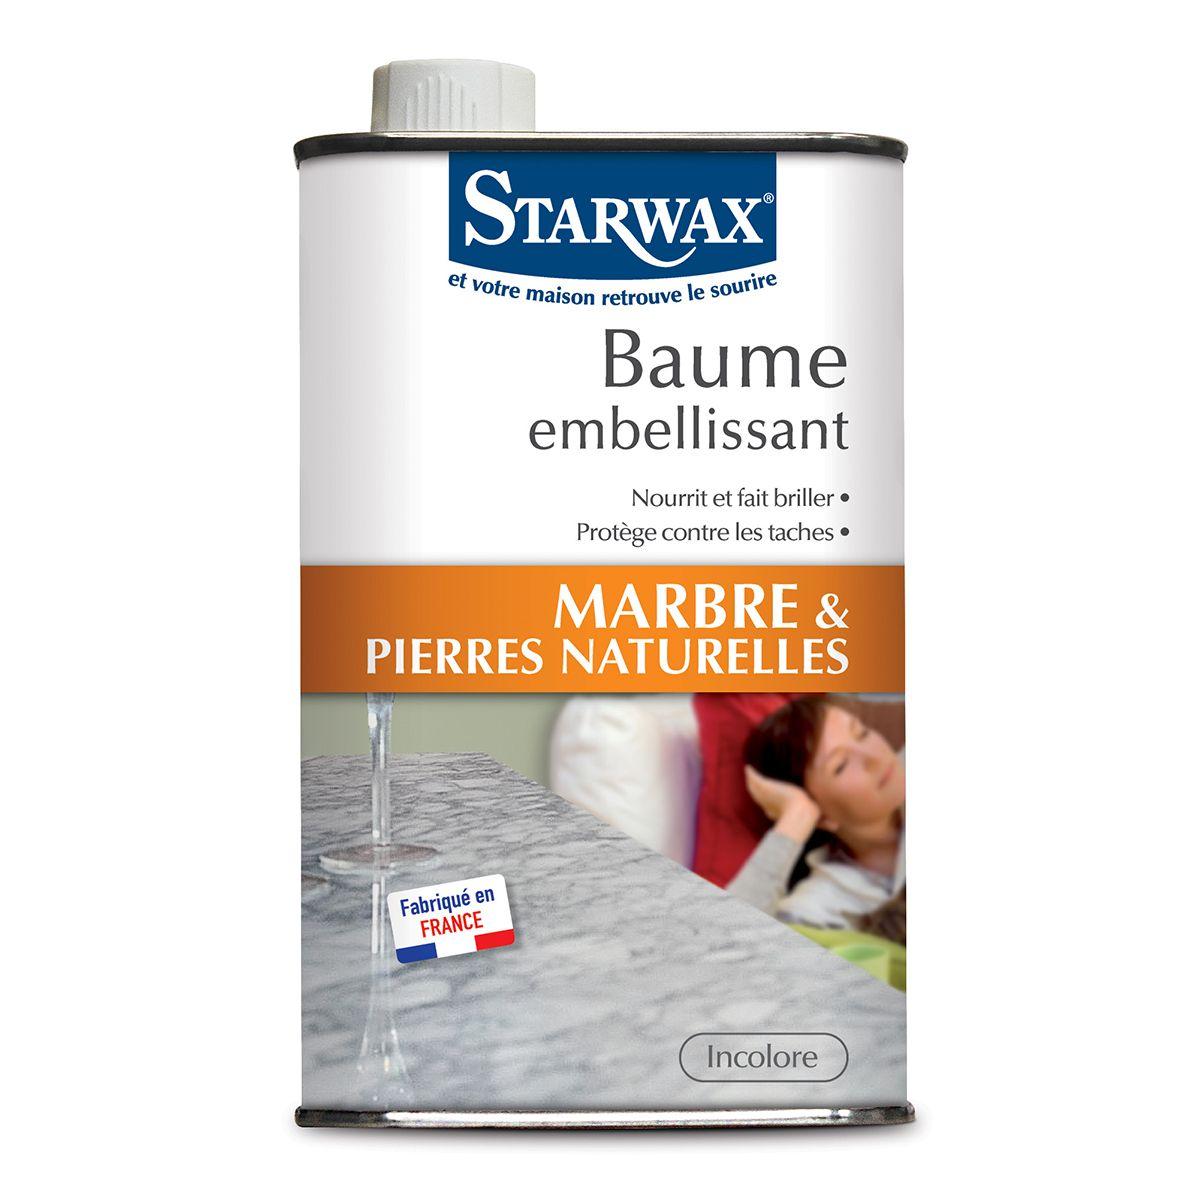 baume embellissant marbre pierres naturelles starwax